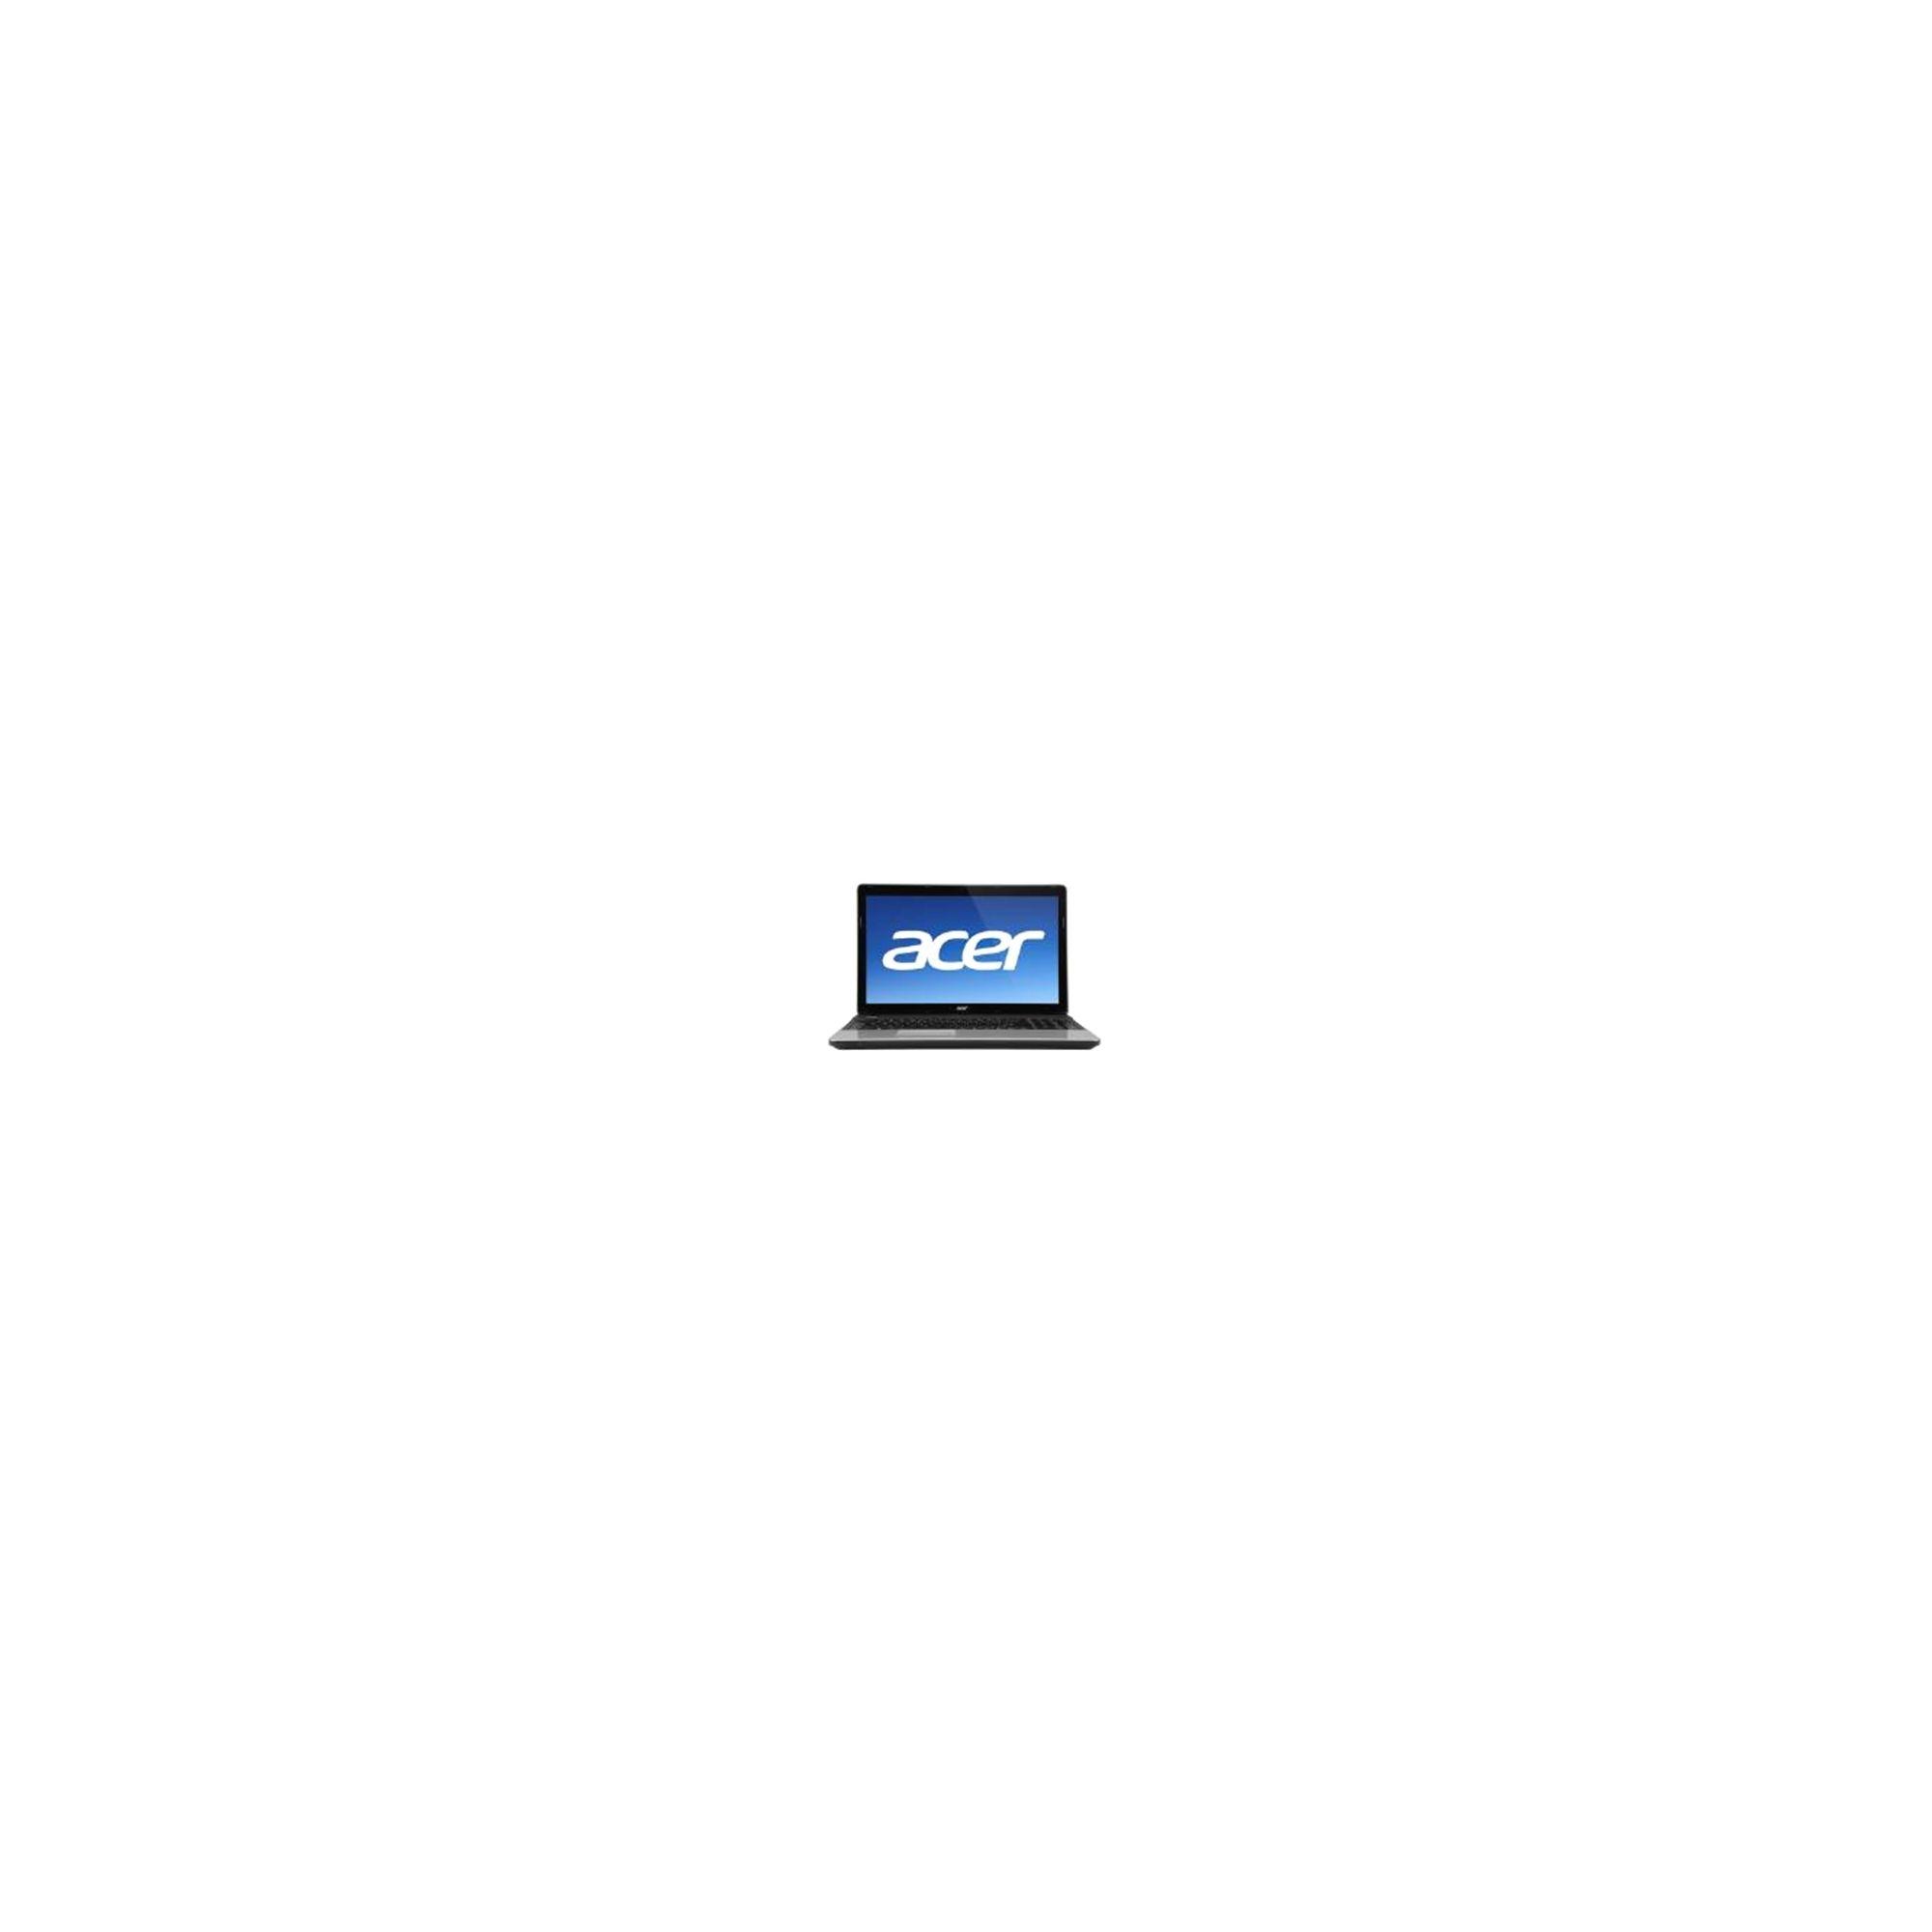 Acer Aspire E1-571-33118G75Mnks (15.6 inch) Notebook PC Core i3 (3110M) 2.4GHz 8GB 750GB DVD Writer WLAN Webcam Windows 8 64-bit (Intel GMA HD) at Tesco Direct